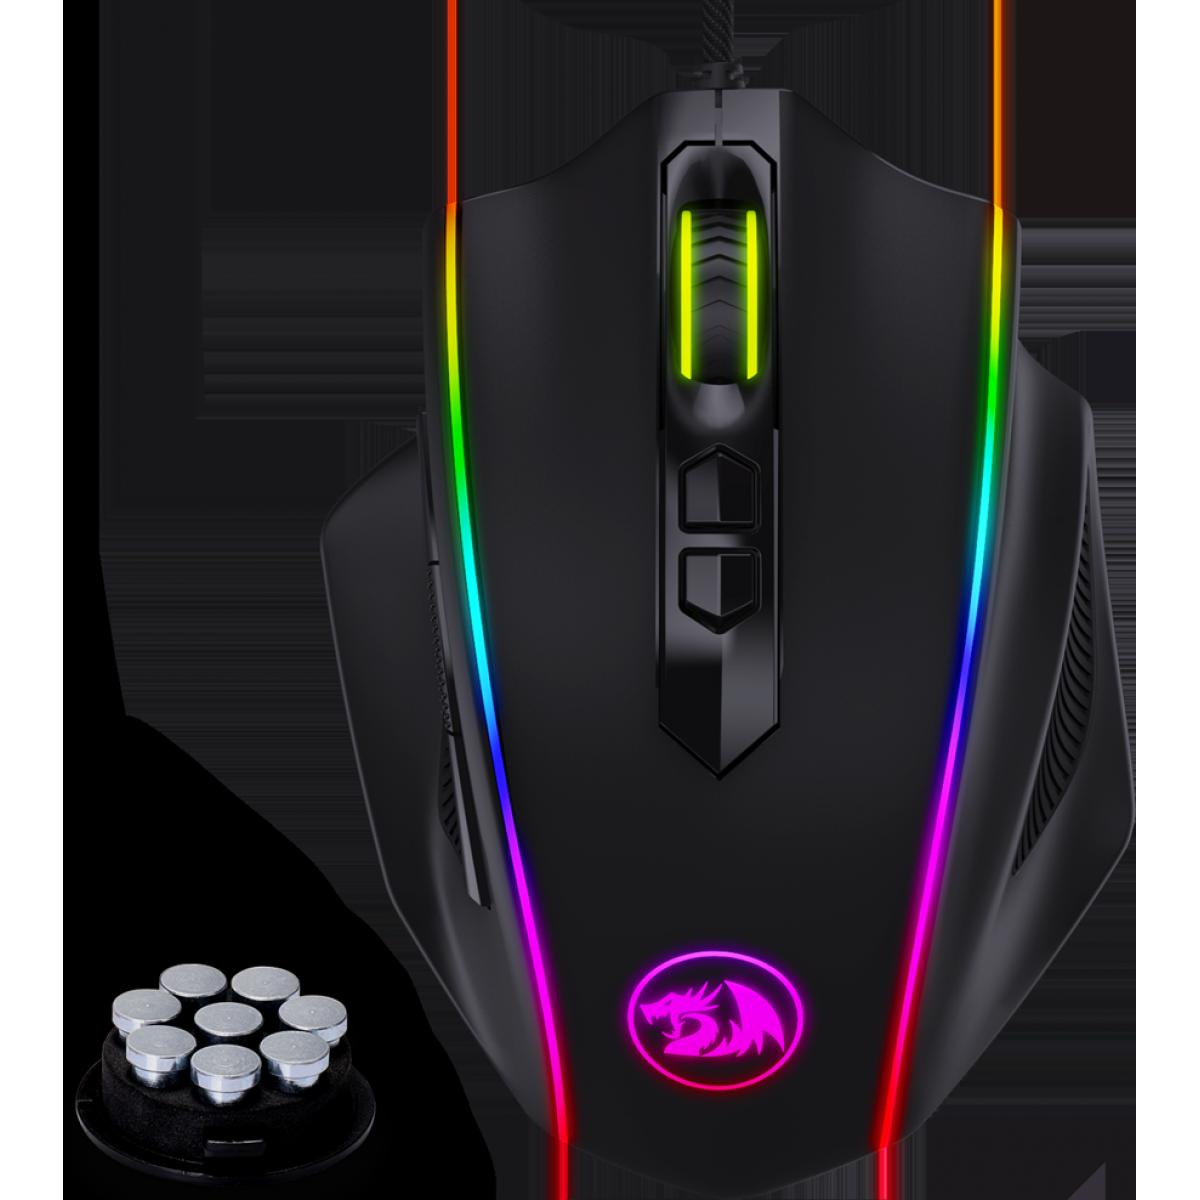 Mouse Gamer Redragon, M720 Vampire, RGB, 10000DPI, 8 Botões, Black, M720-RGB